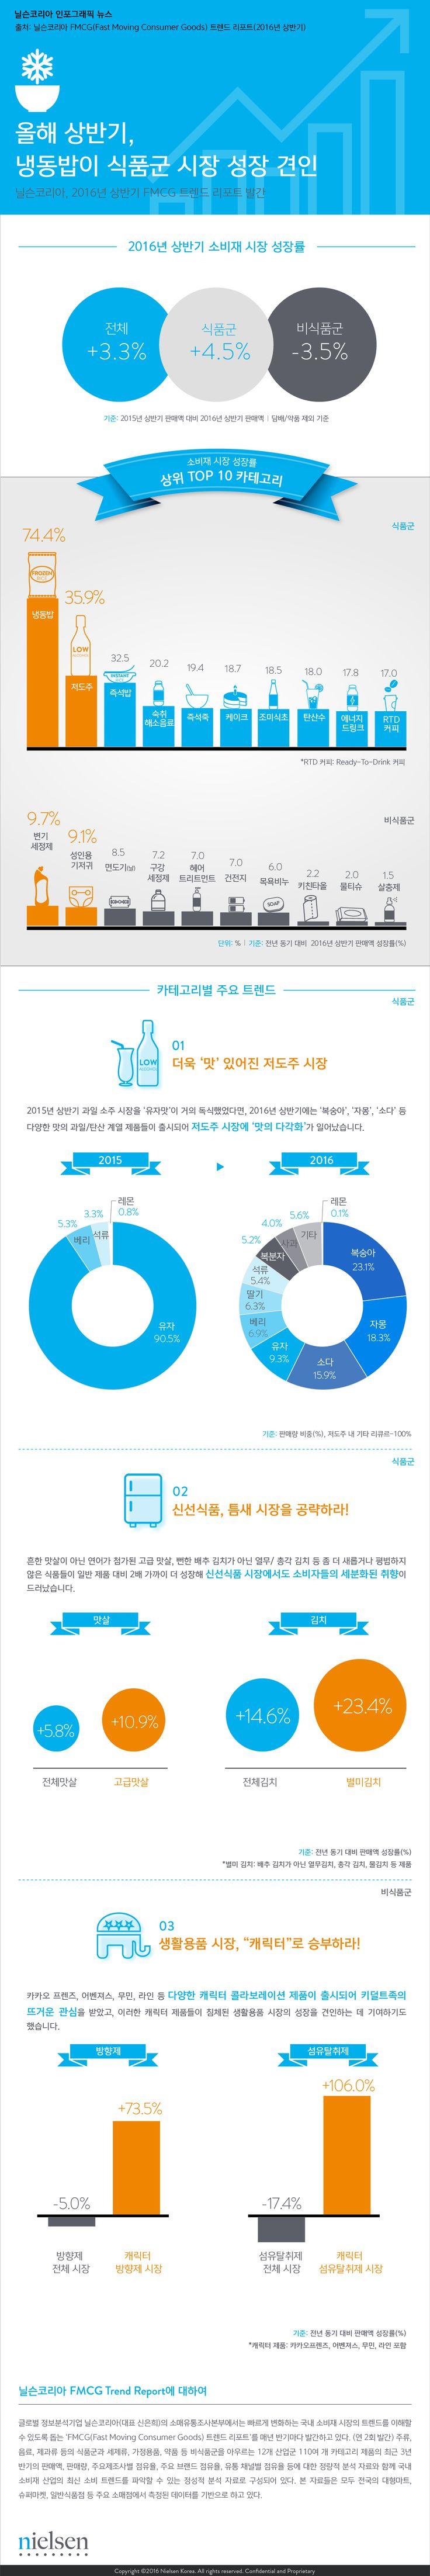 [Nielsen Korea Infographic] 2016년 상반기 'FMCG 트렌드 리포트' 발간 #infographic #fmcg #닐슨코리아 #인포그래픽 #리포트 #소비재트렌드